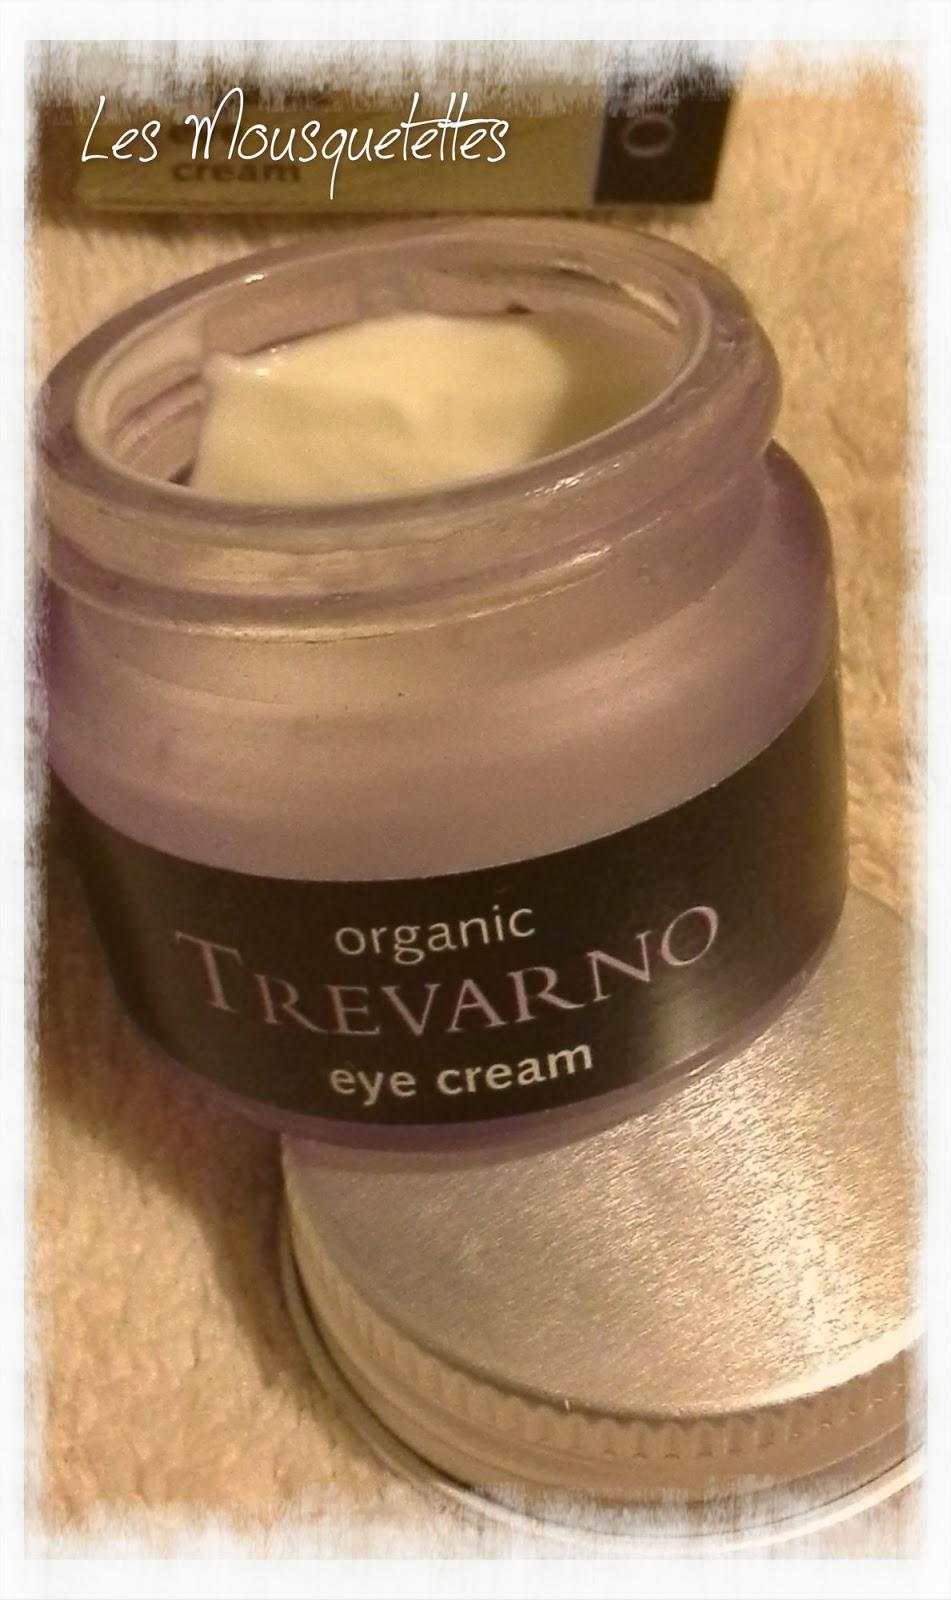 Eye cream Organic Trevarno - Les Mousquetettes©